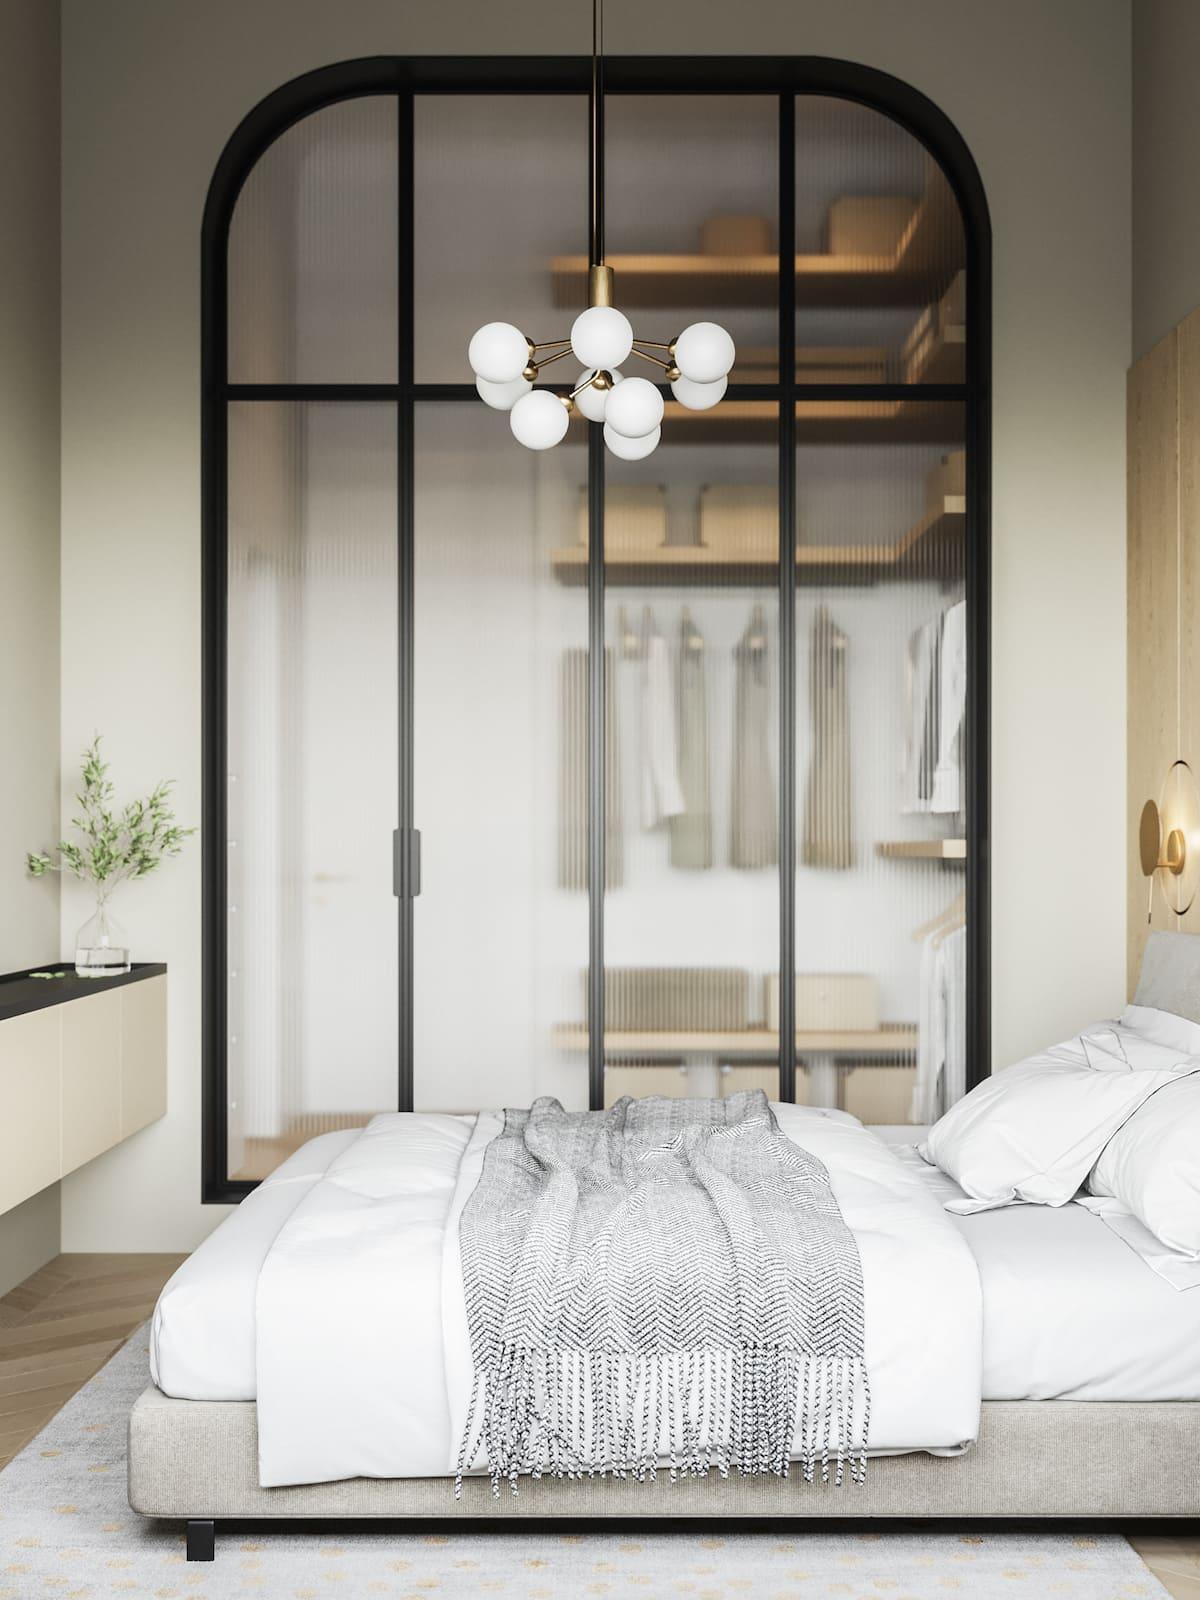 дизайн интерьера модной квартиры фото 29